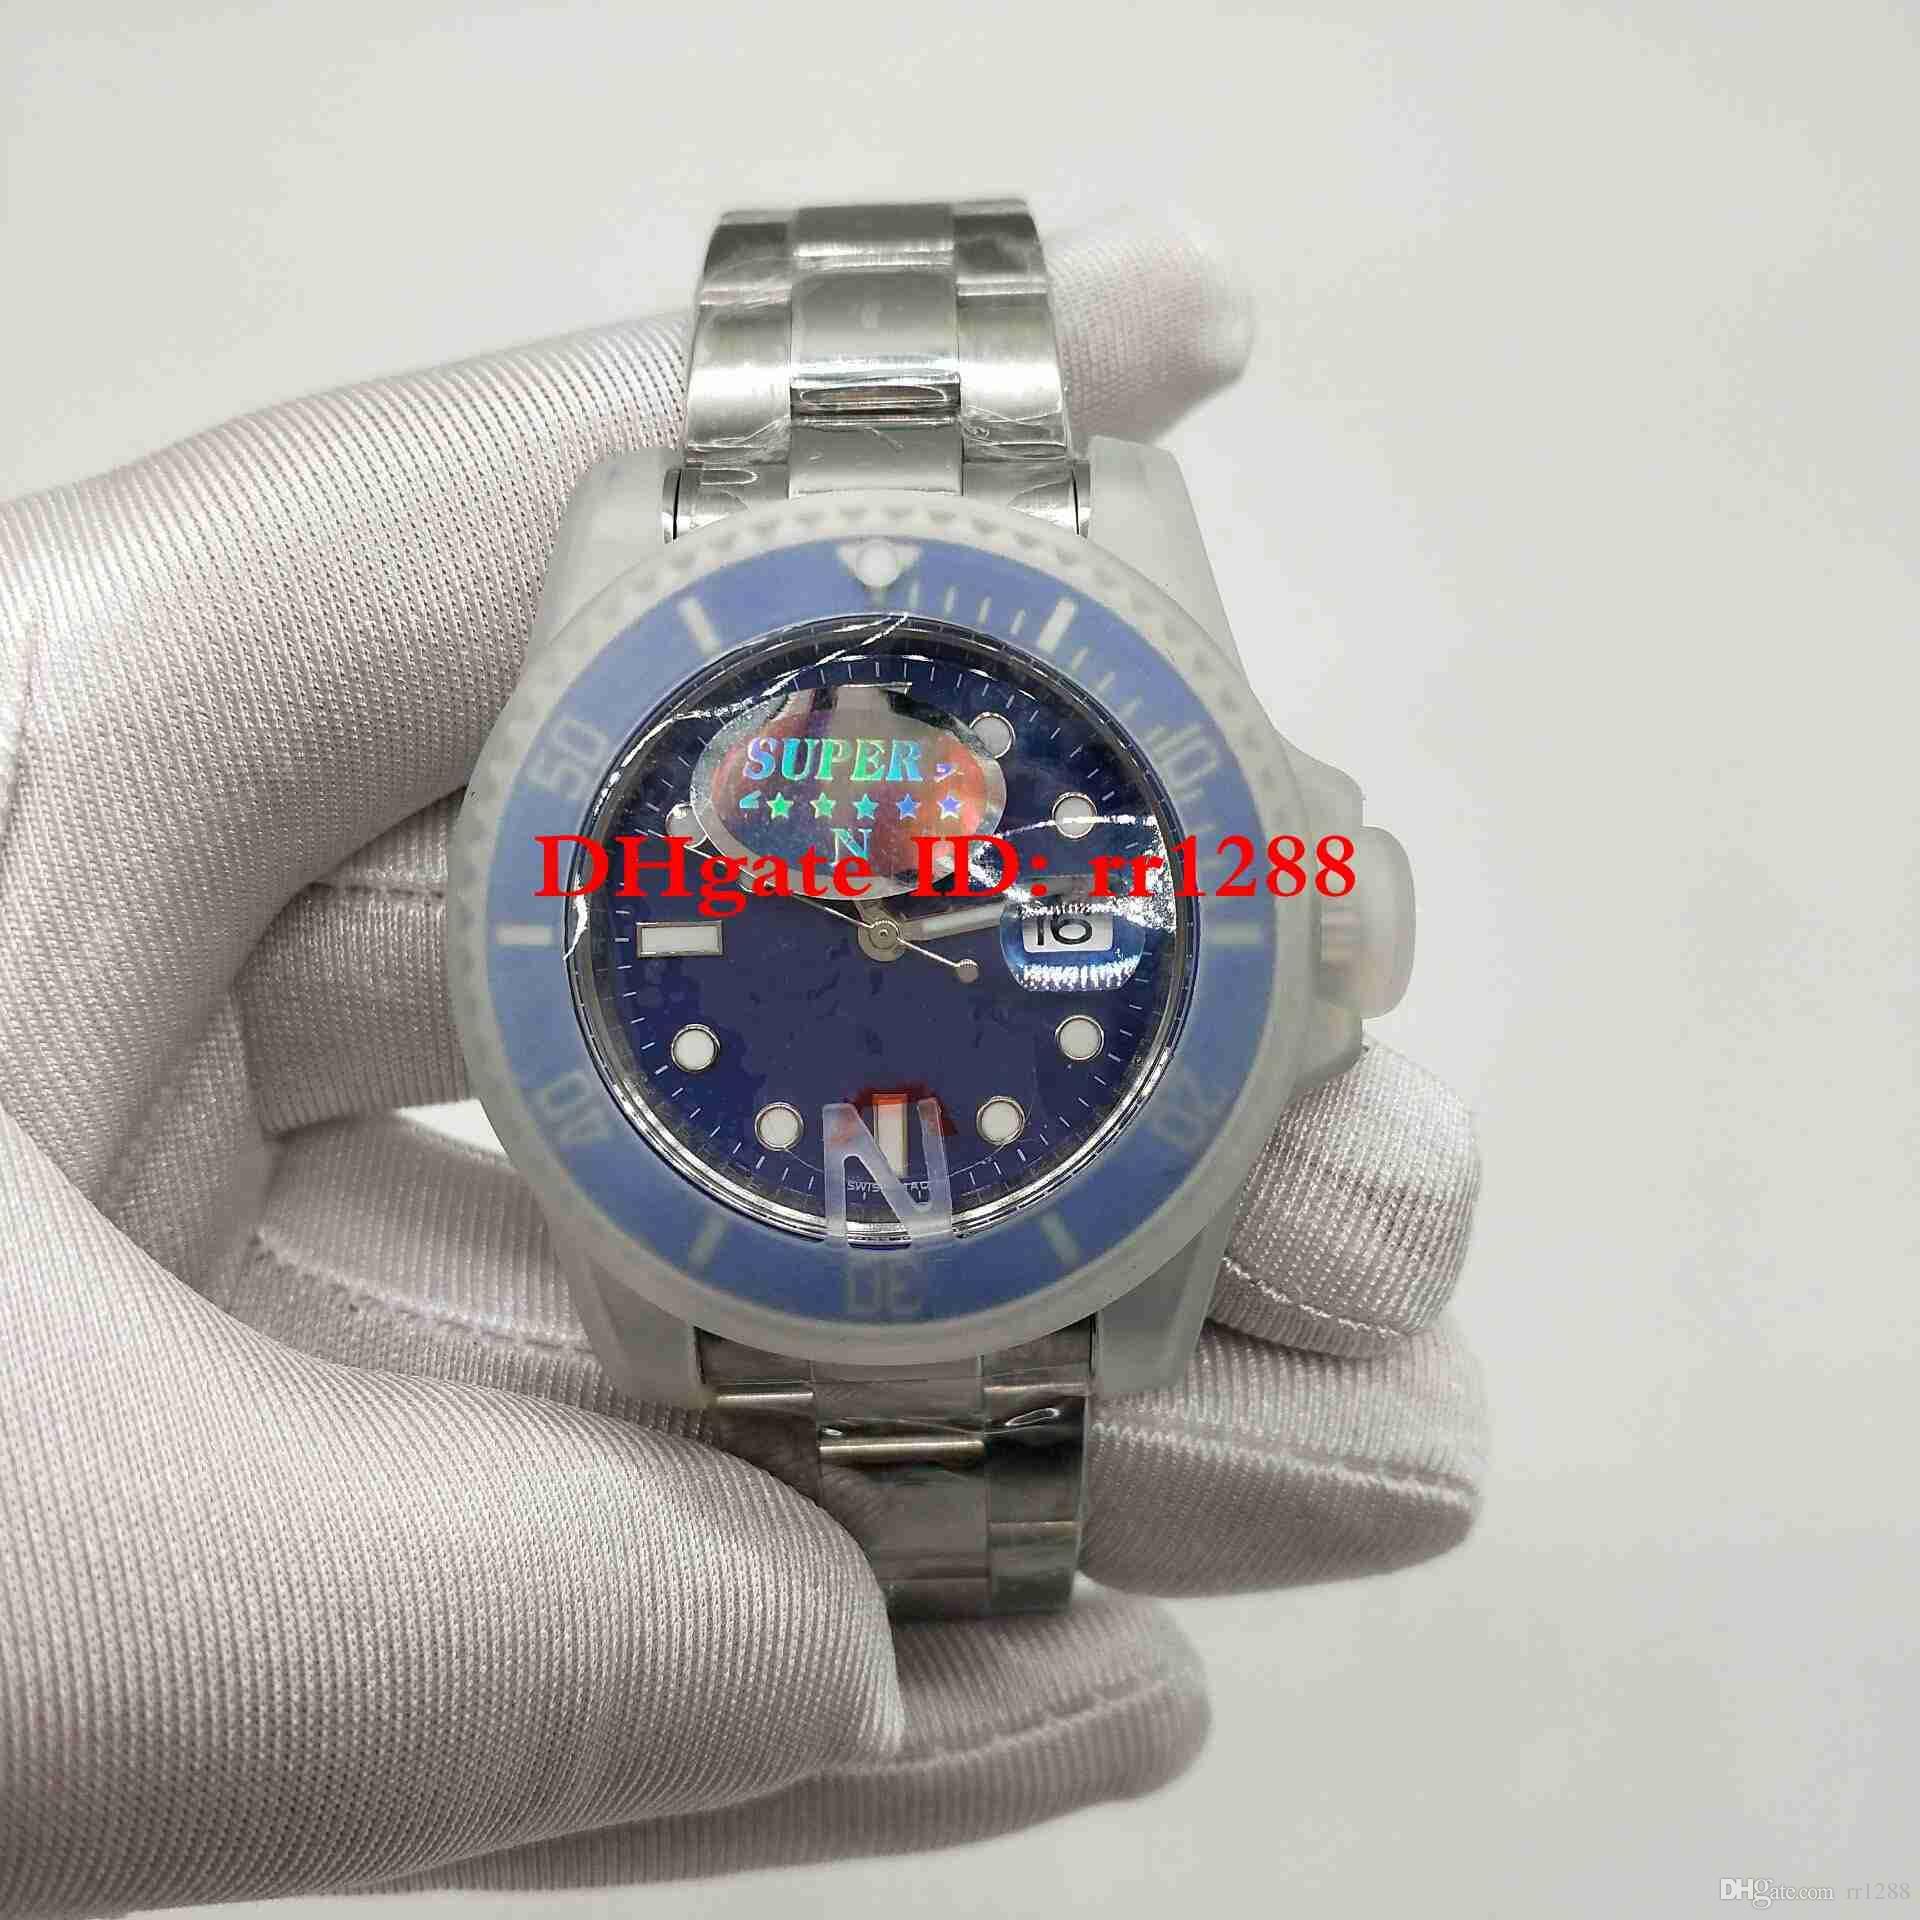 Super N Fabrik Uhr 116619LB V7 2813 Automatikwerk Keramik Lünette Saphirglas 40 MM Blaues Zifferblatt 116610 116619 Tauchen Herrenuhren